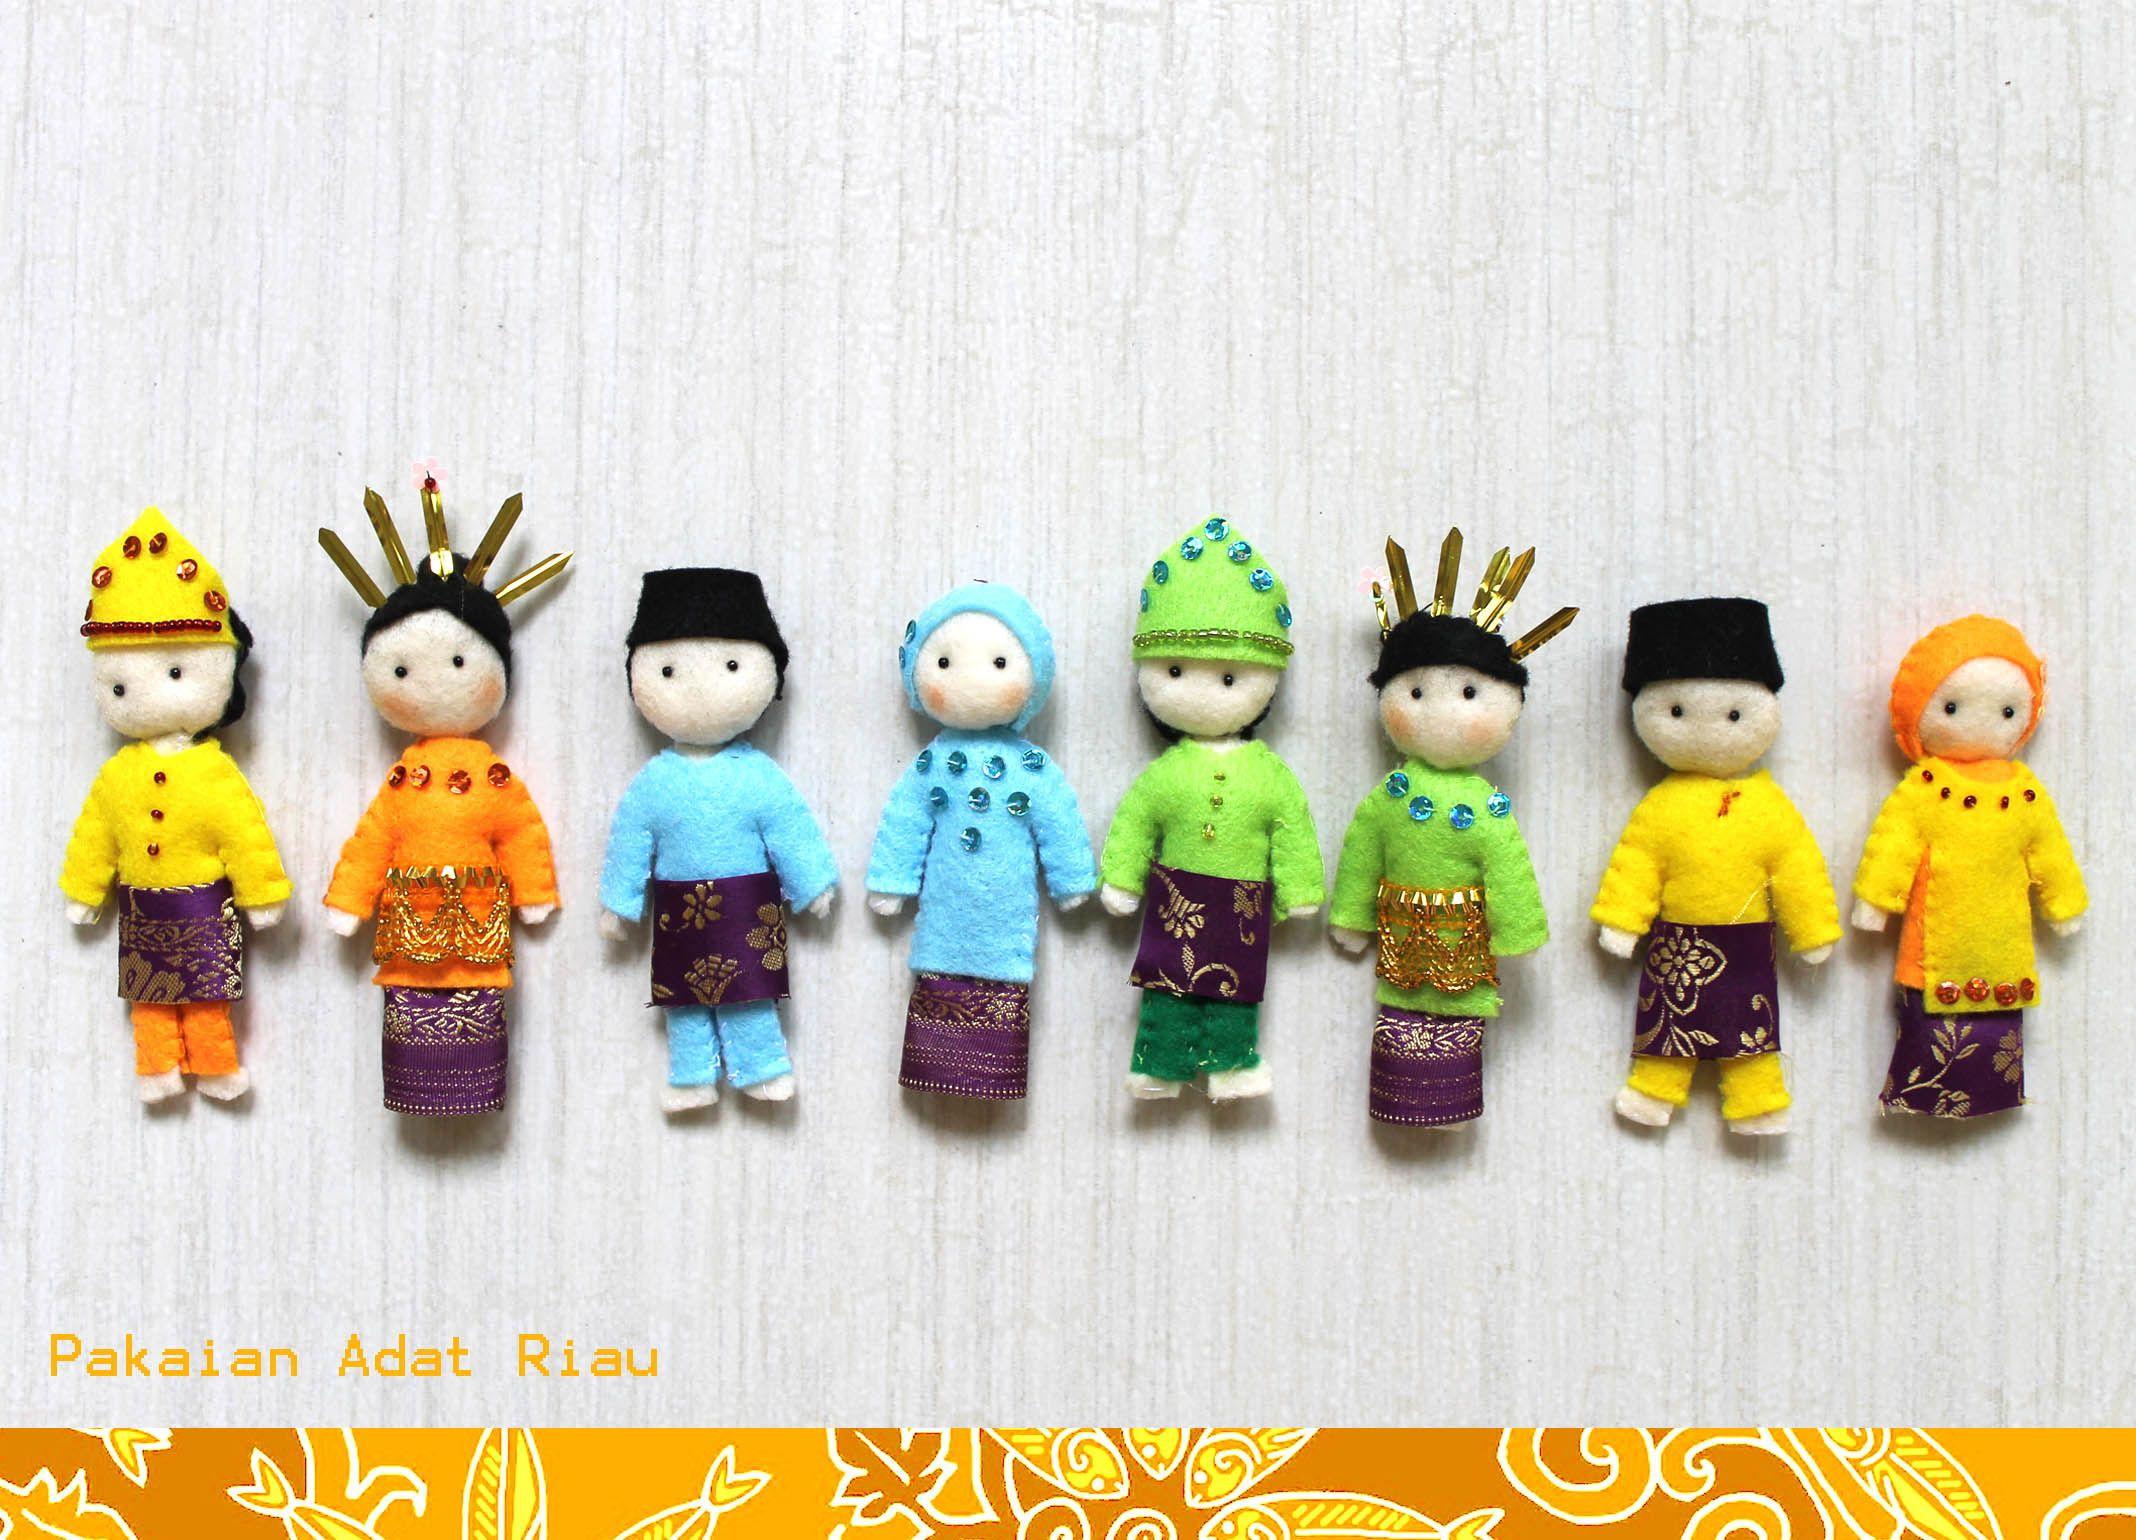 Riau Melayu traditional costumes Baju Kurung Teluk Belanga miki craft